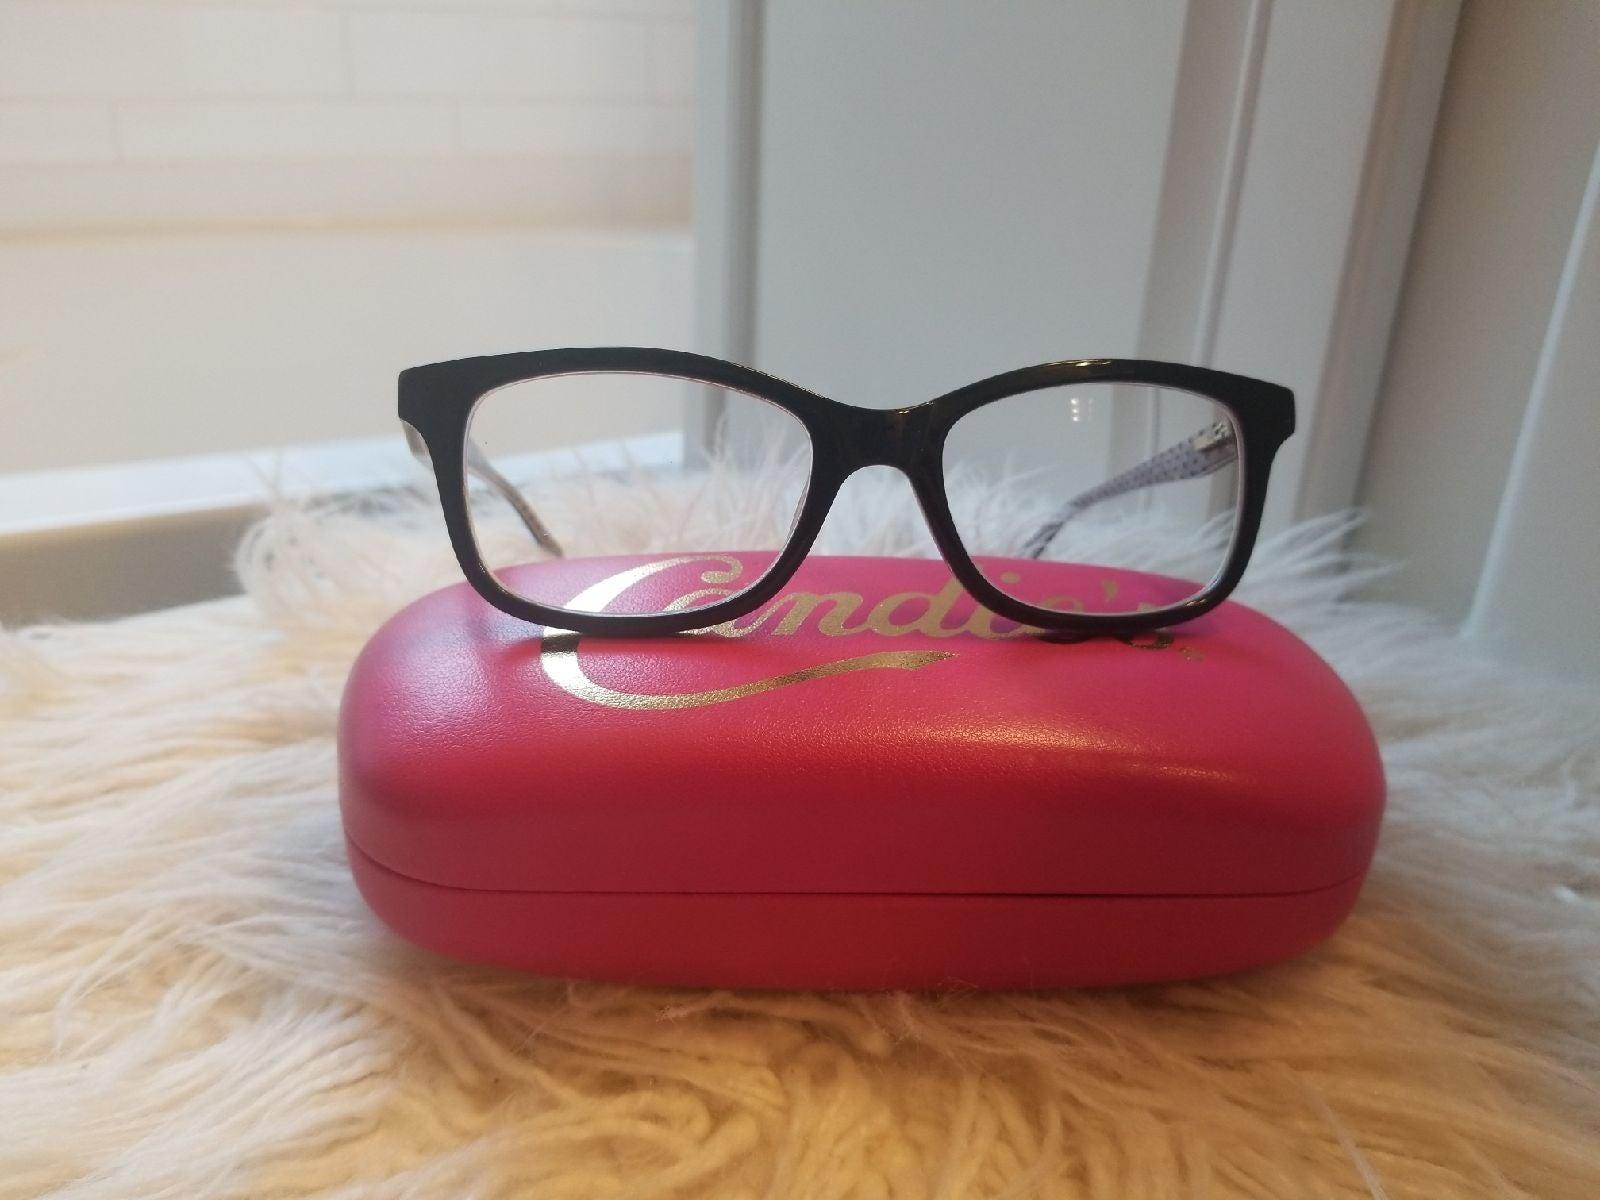 Candies glasses